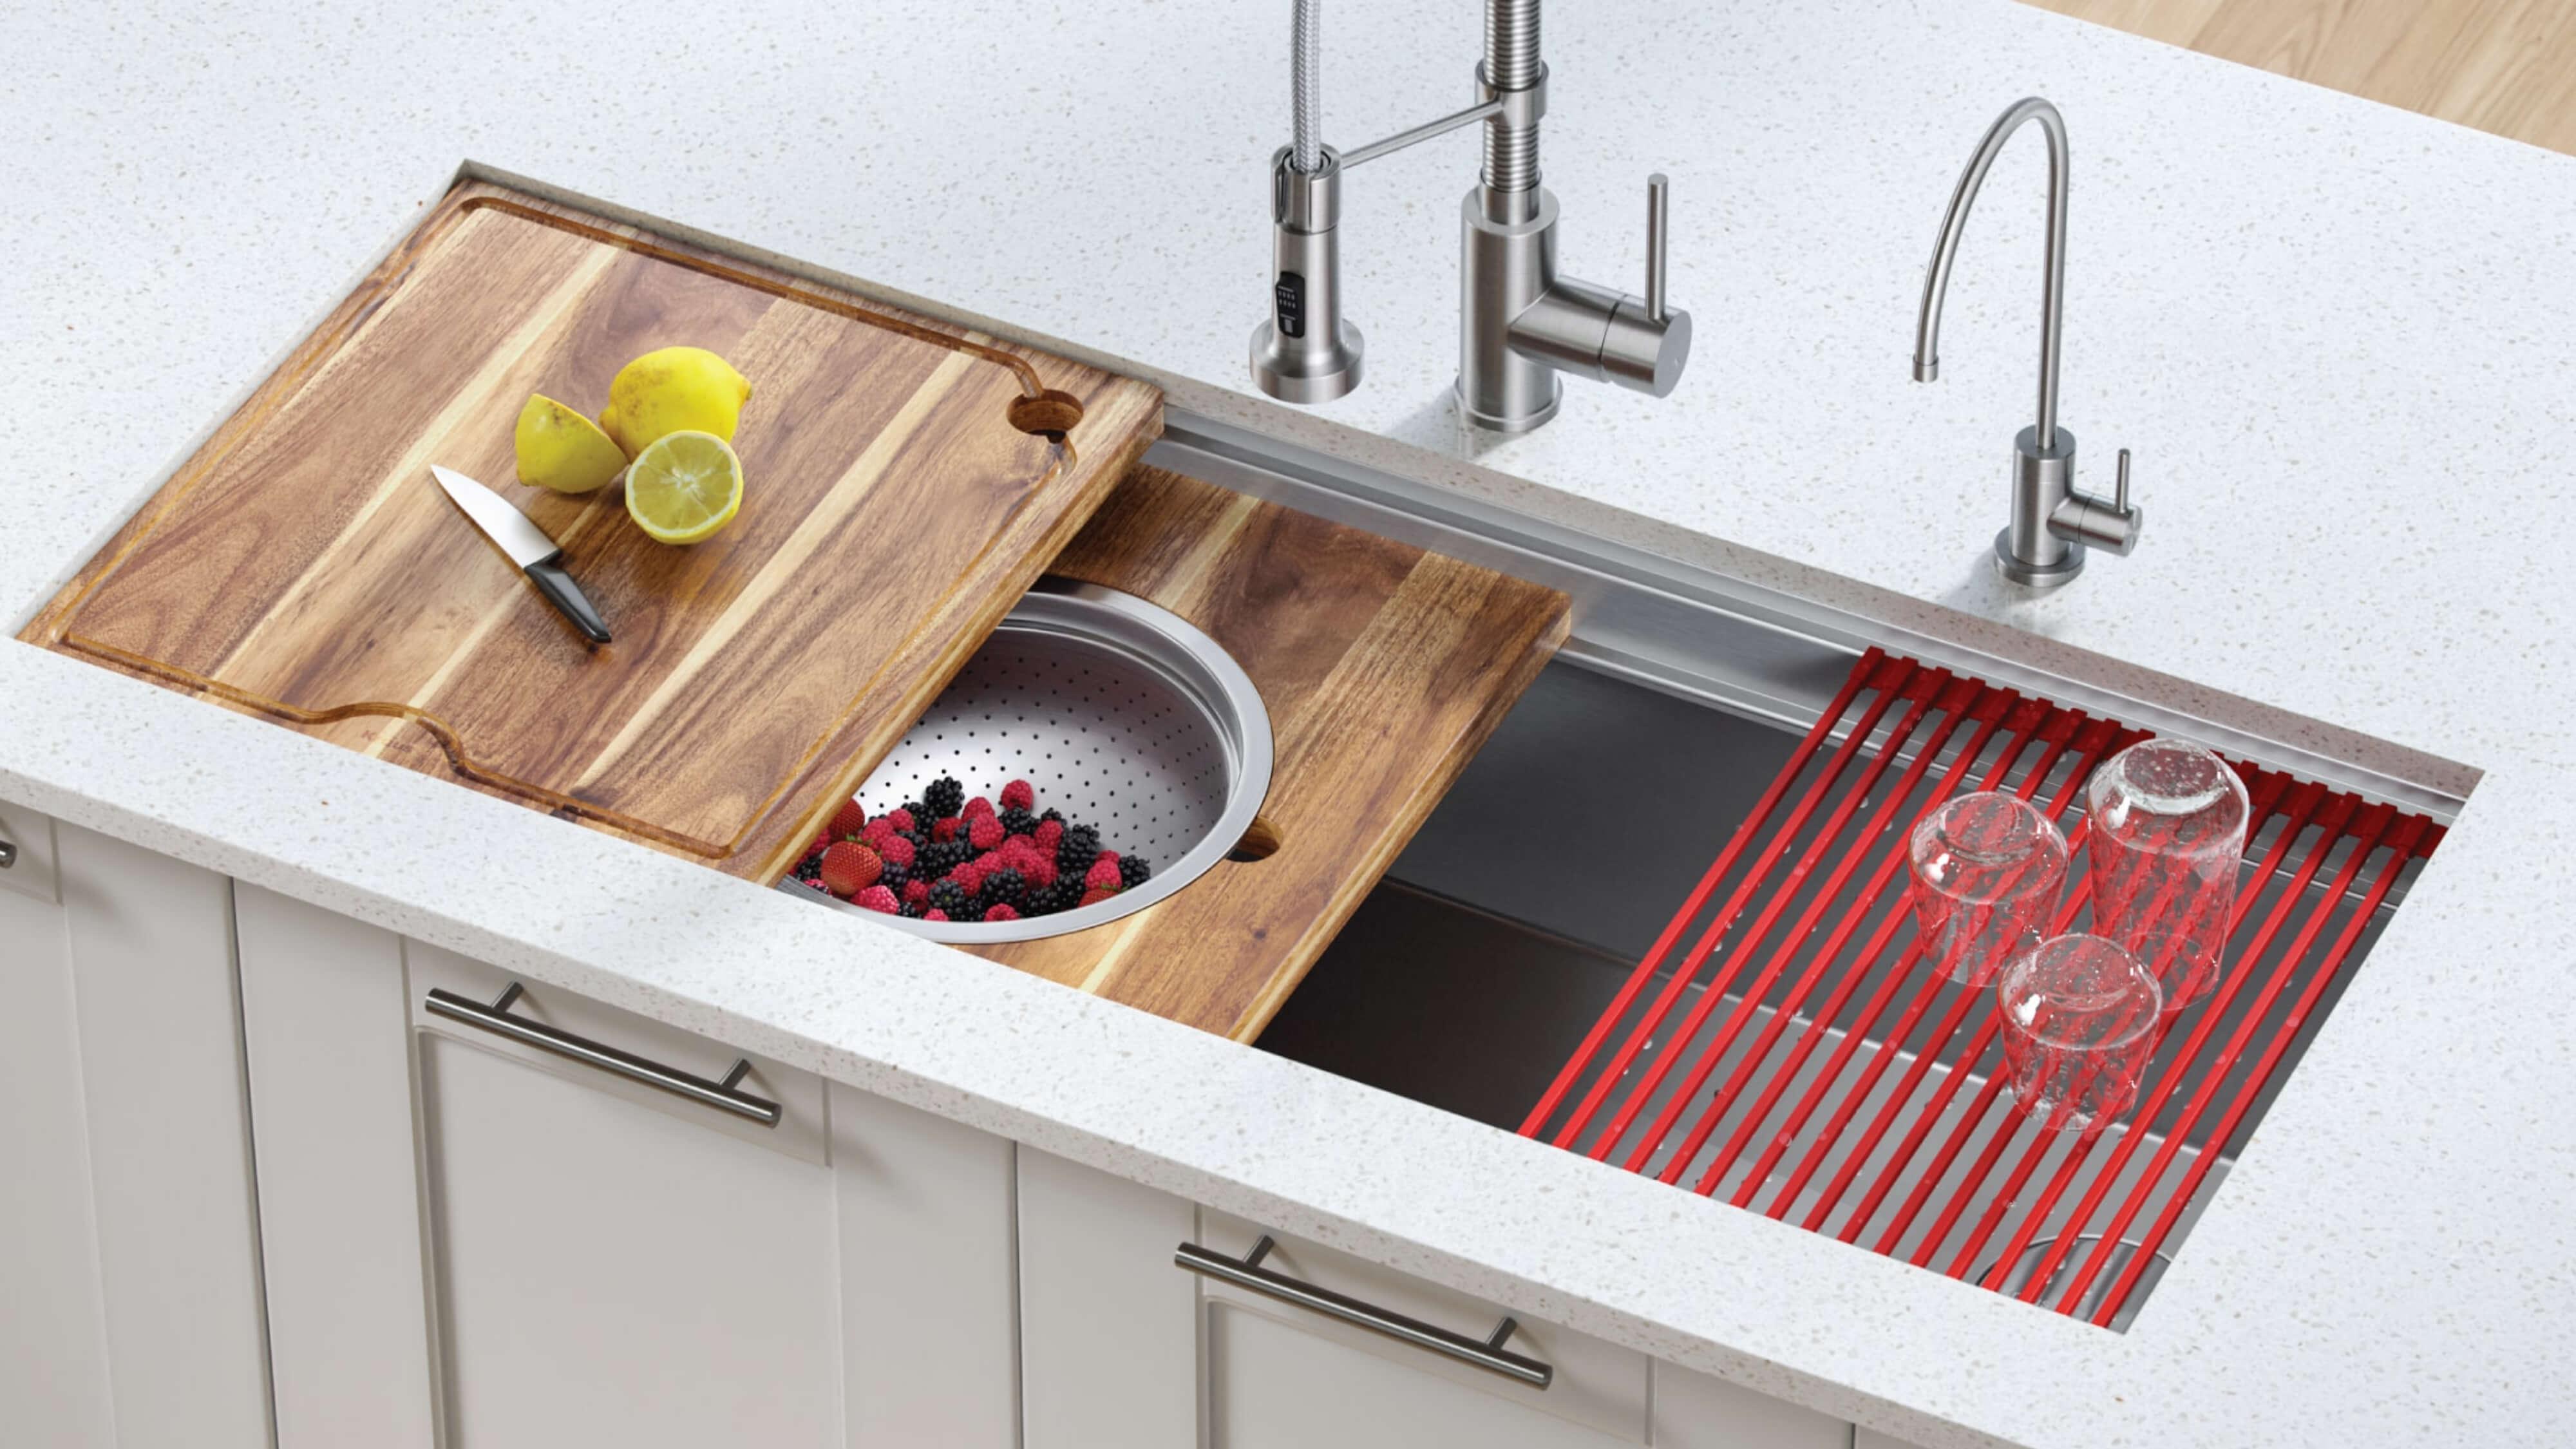 Fathers-Day-45-inch-worksation-sink-Kraus-USA